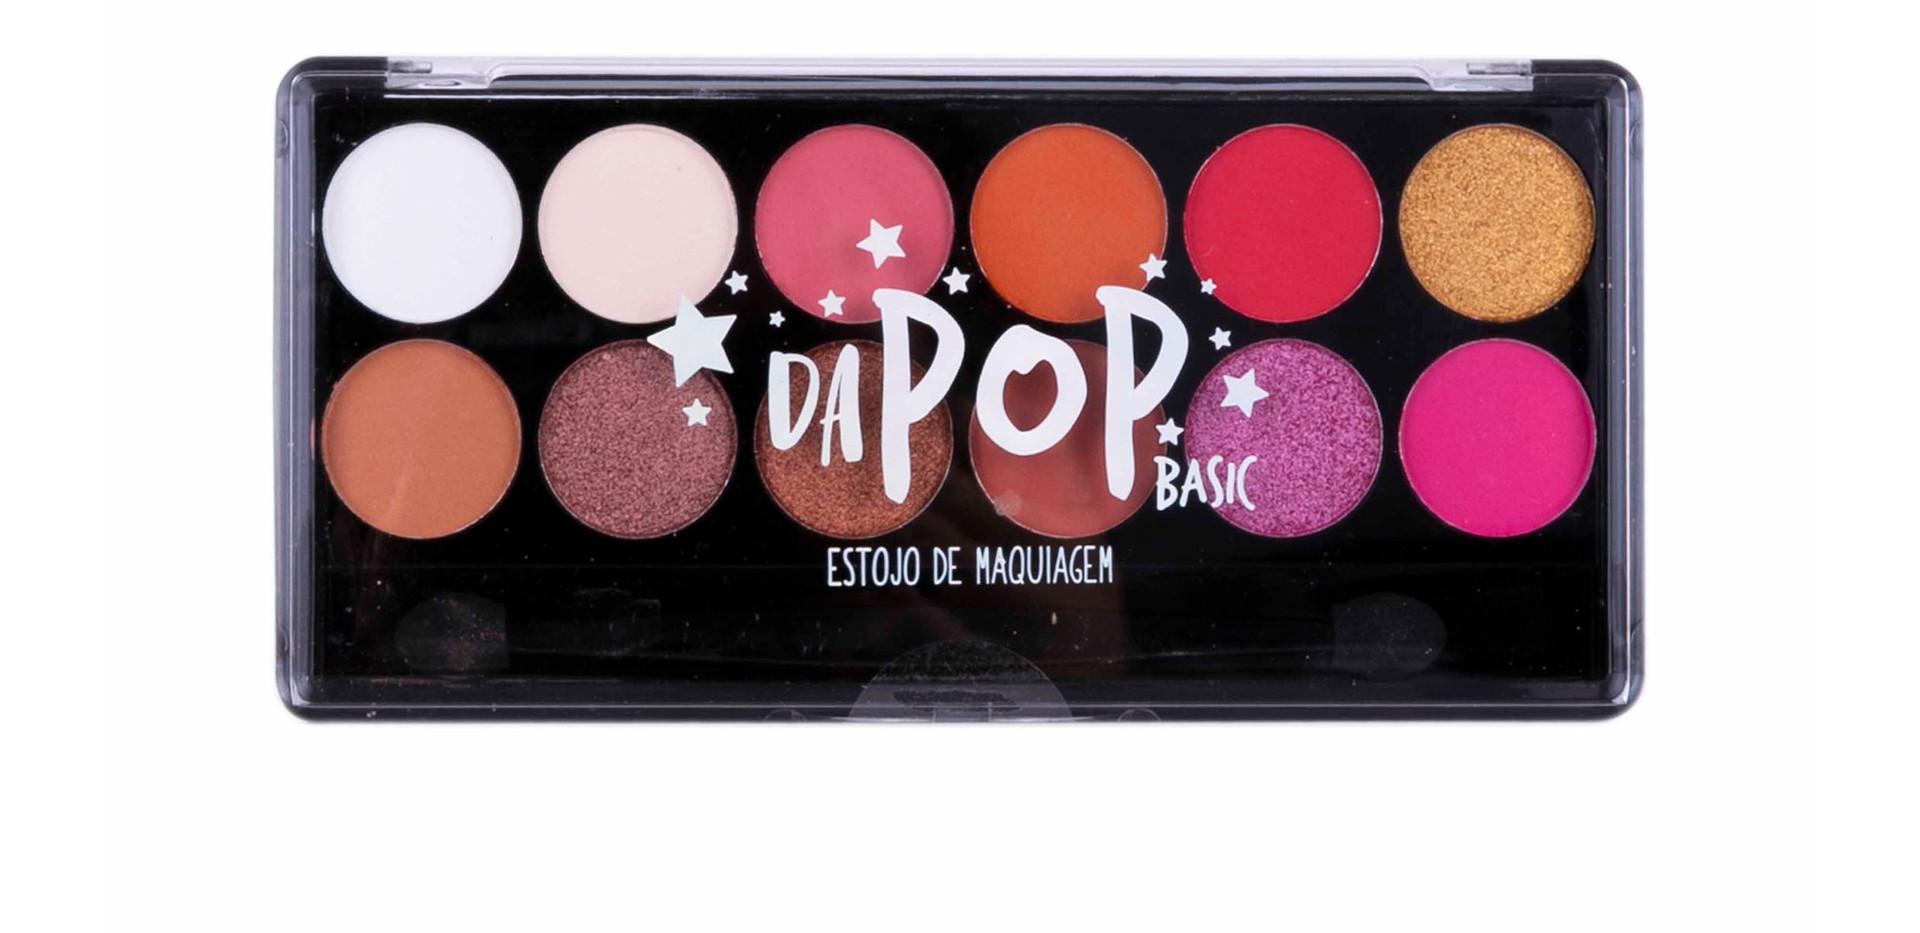 Paleta de Sombras Basic Dapop - HB96773